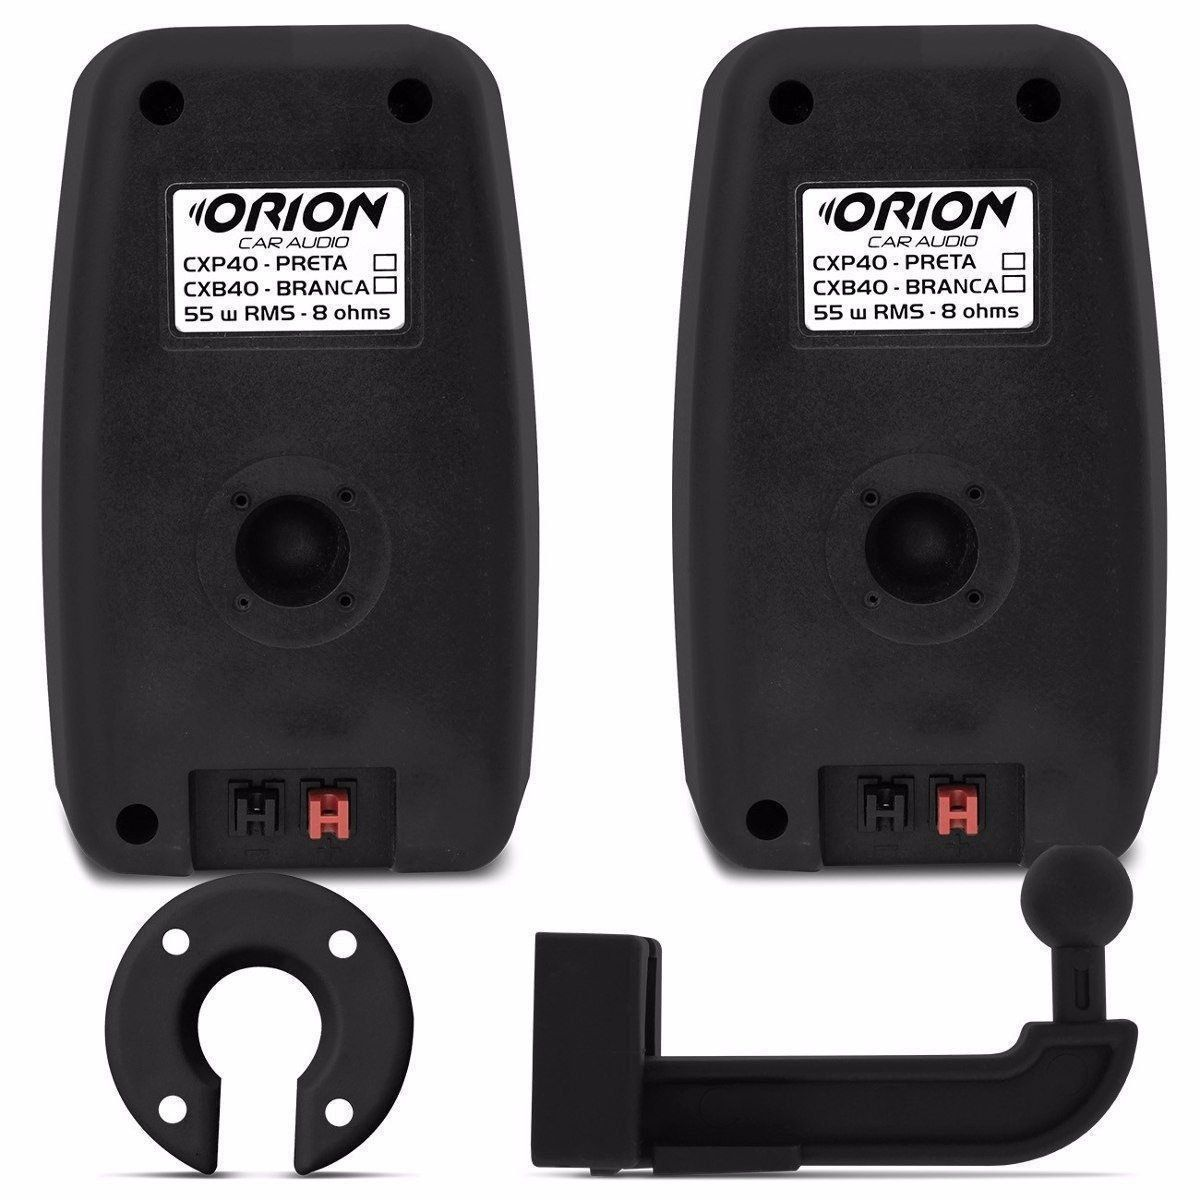 Kit Caixas Som Ambiente Tsr Orion Cbx40 8 Ohms 110w Preta